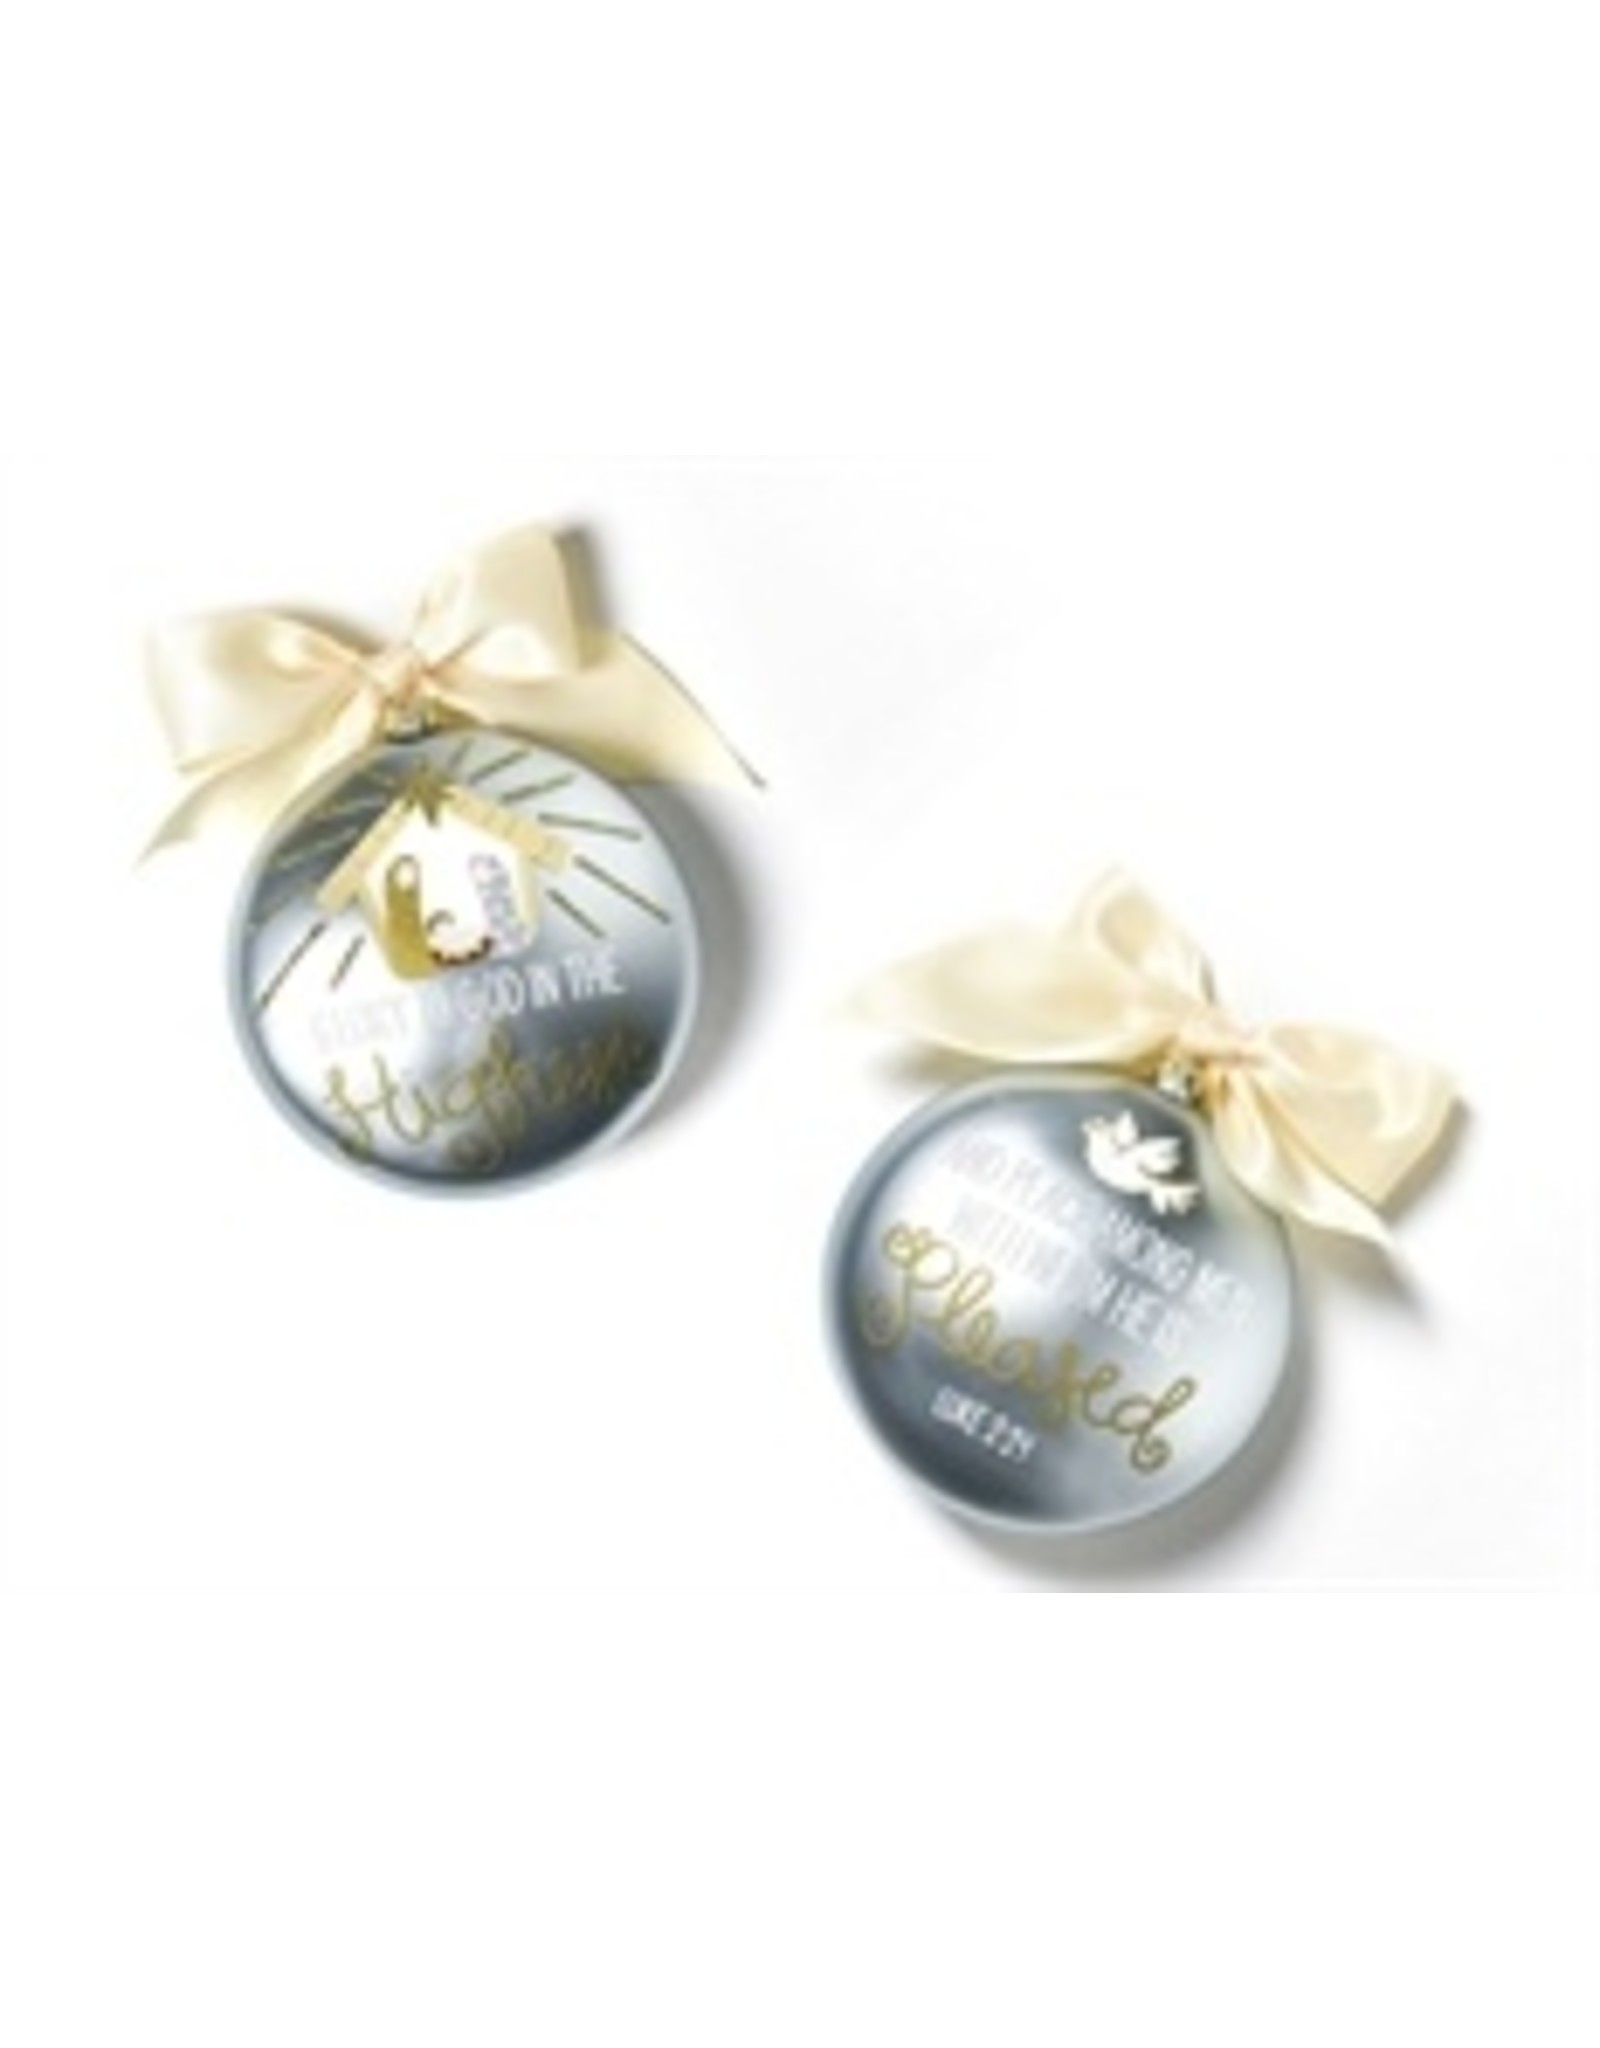 Luke 2:14 Ornament